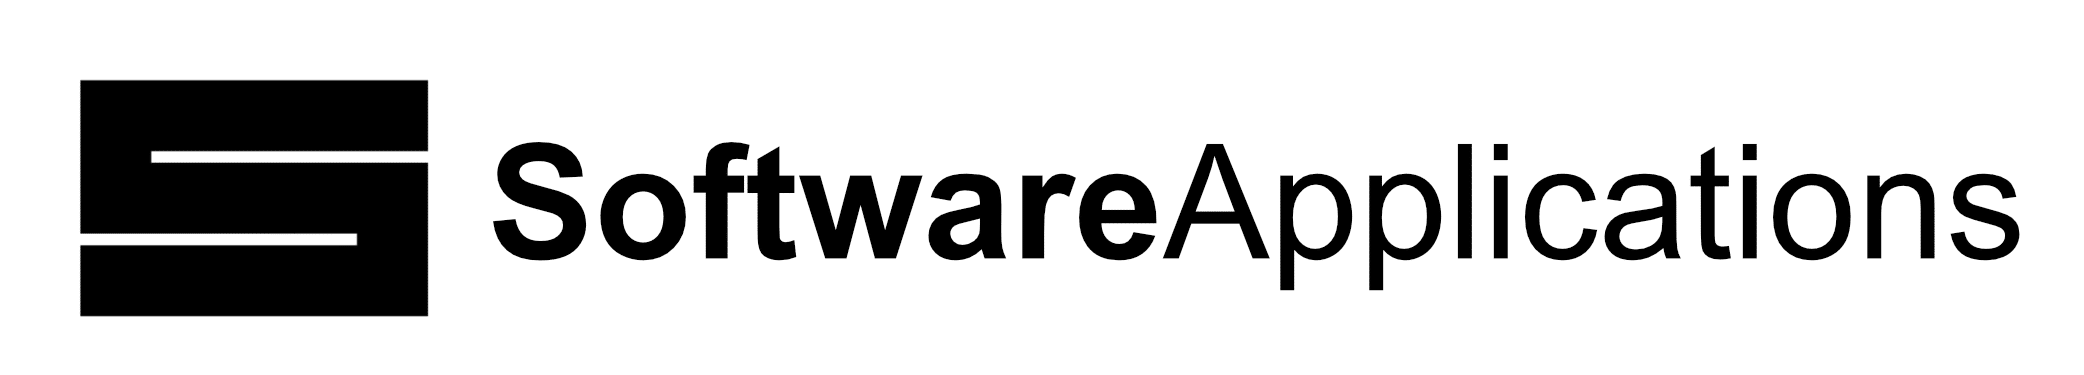 SoftwareApplications.com